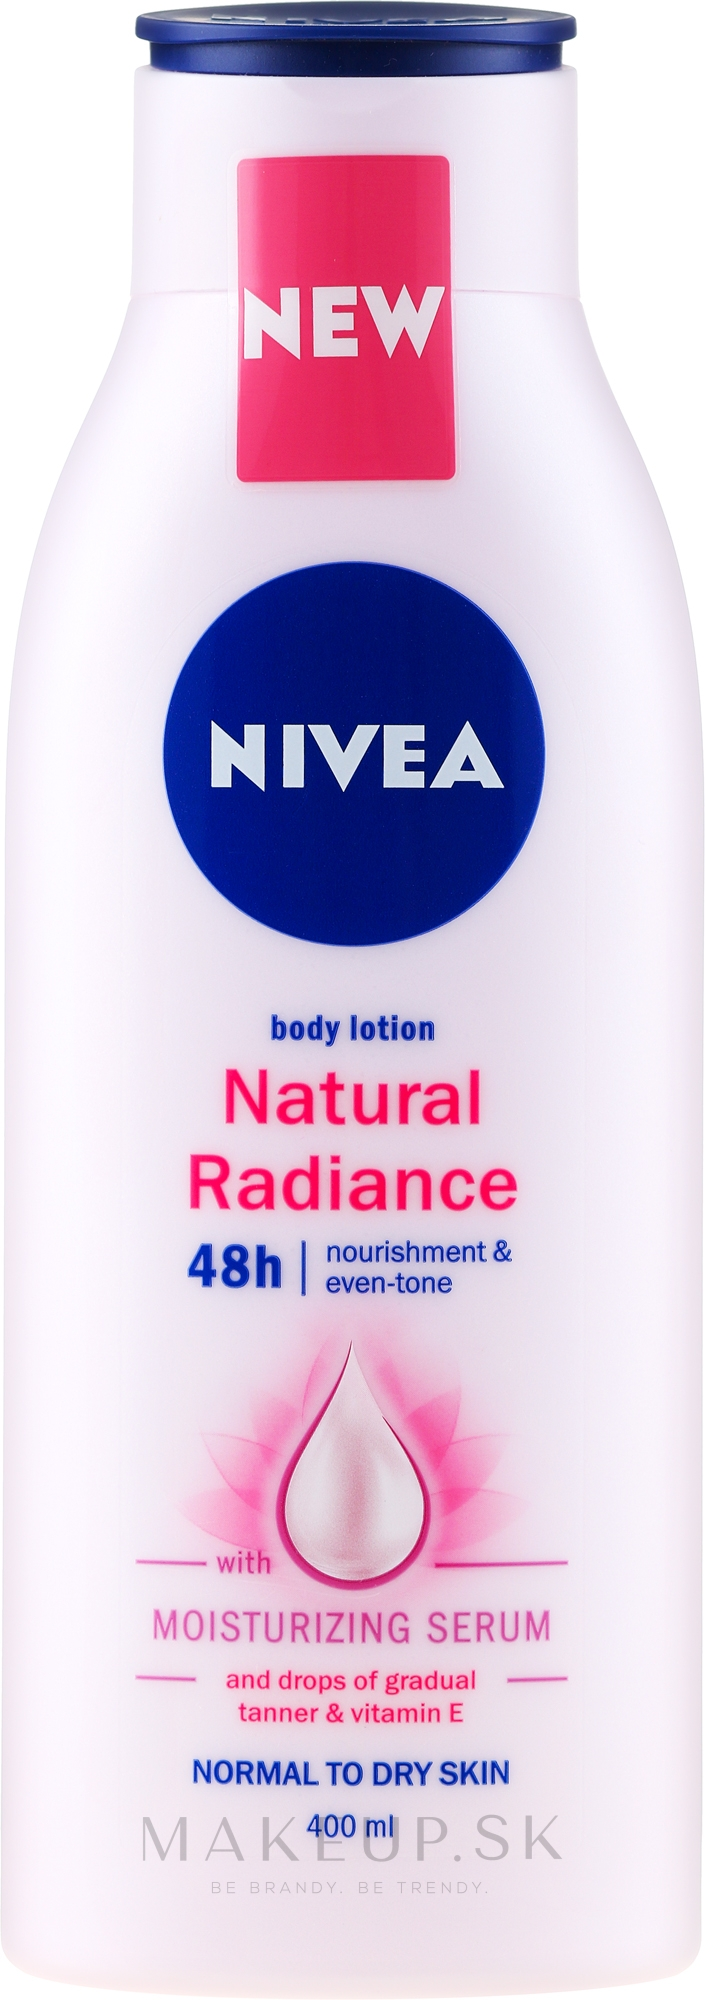 Lotion na telo - Nivea Natural Radiance Body Lotion — Obrázky 400 ml